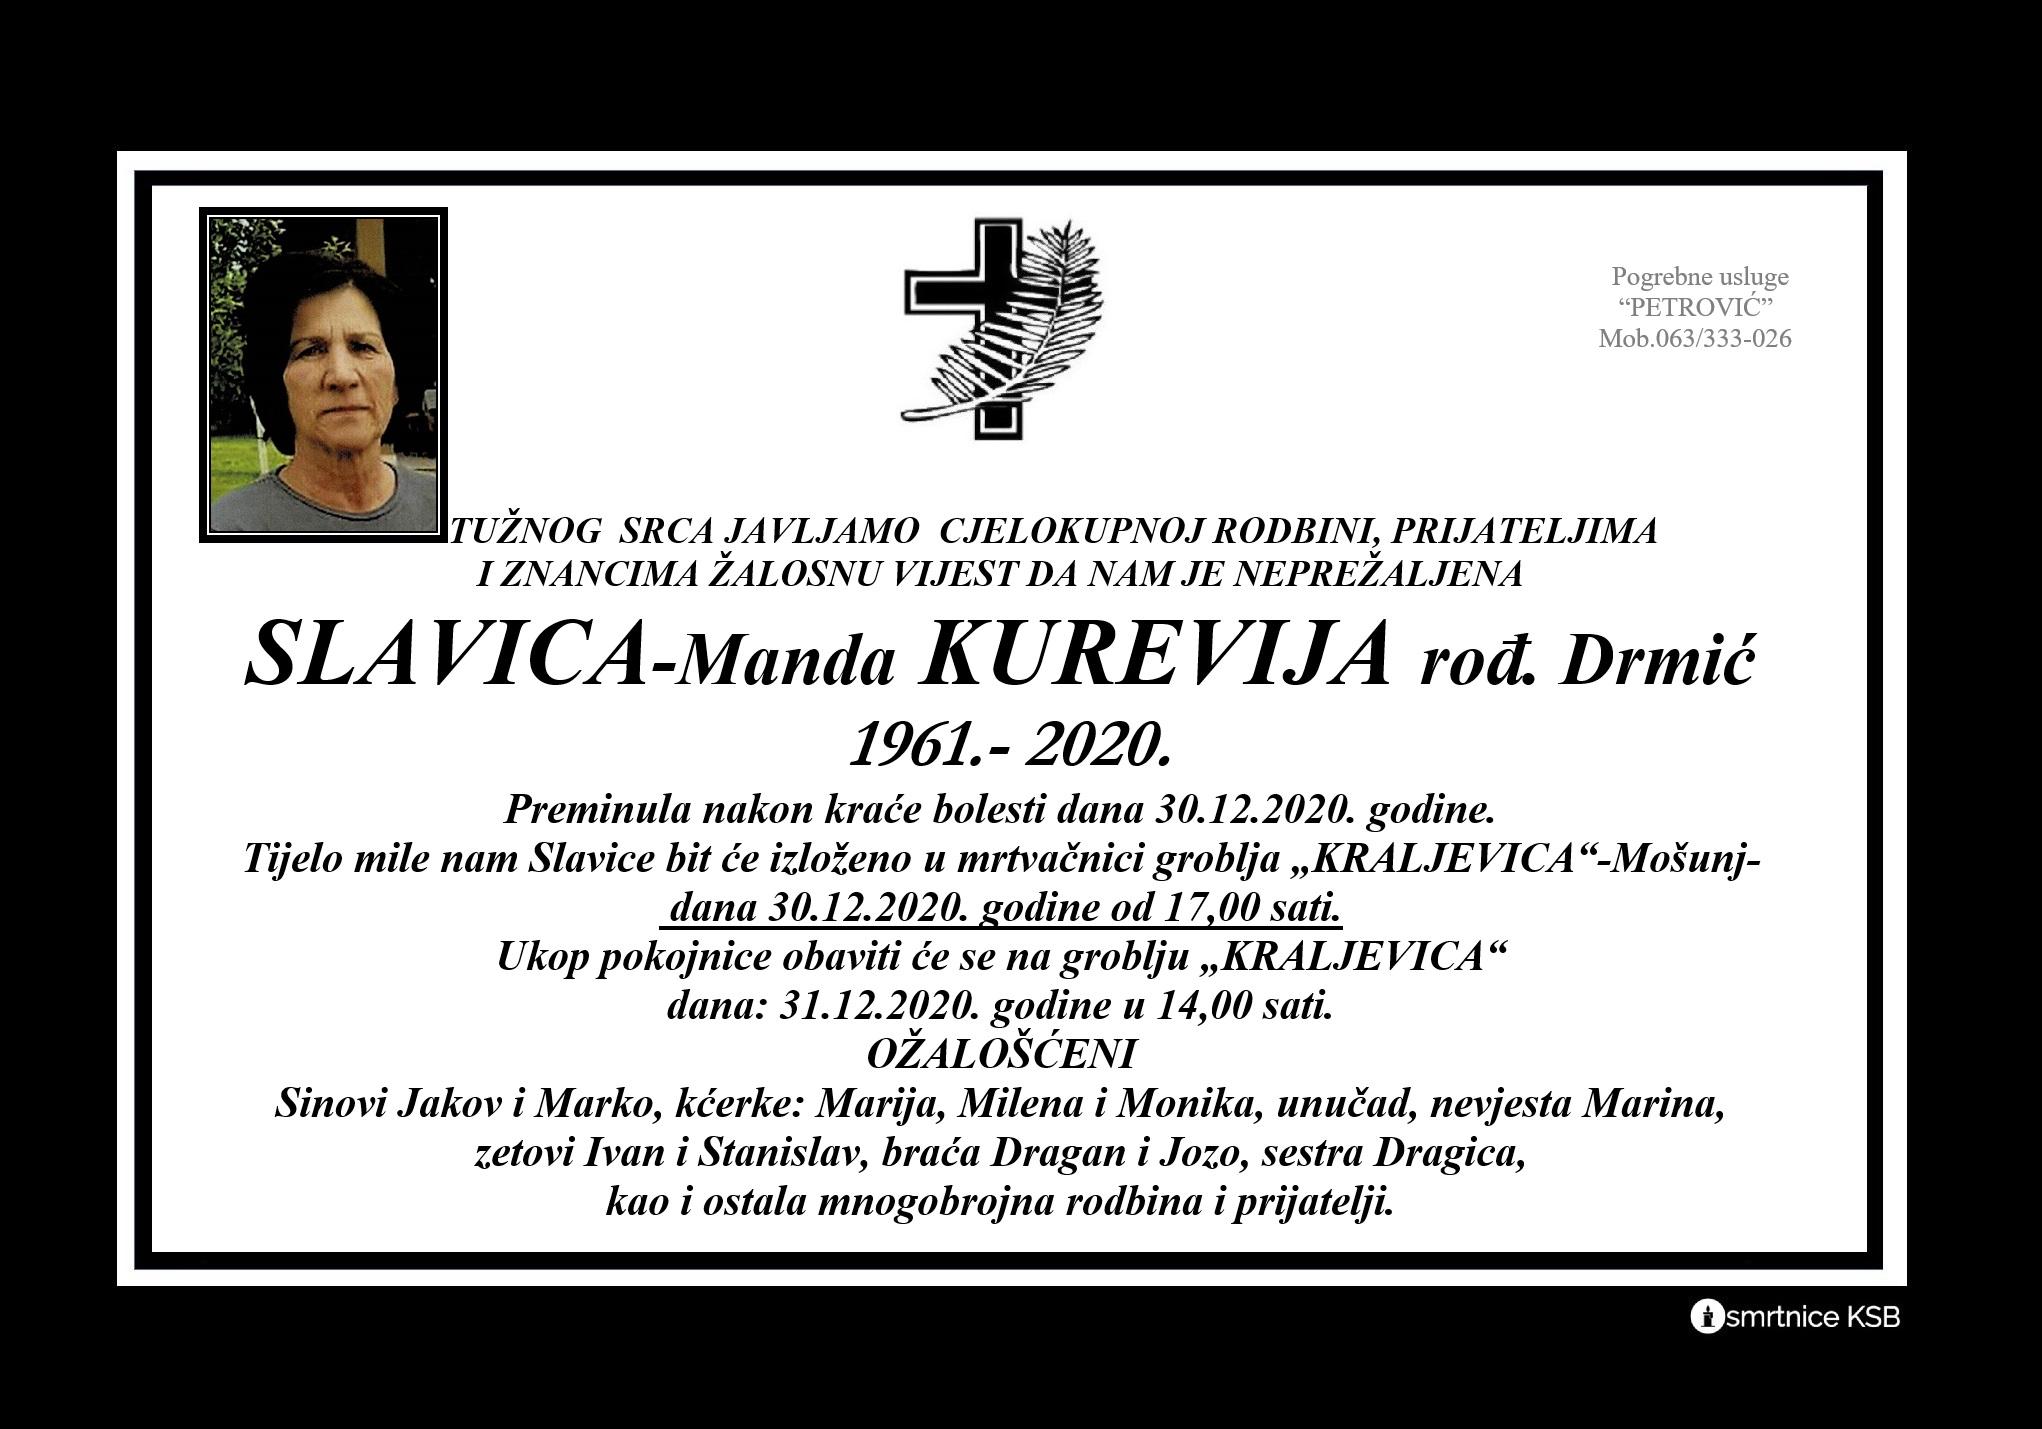 Slavica-Manda Kurevija rođ. Drmić